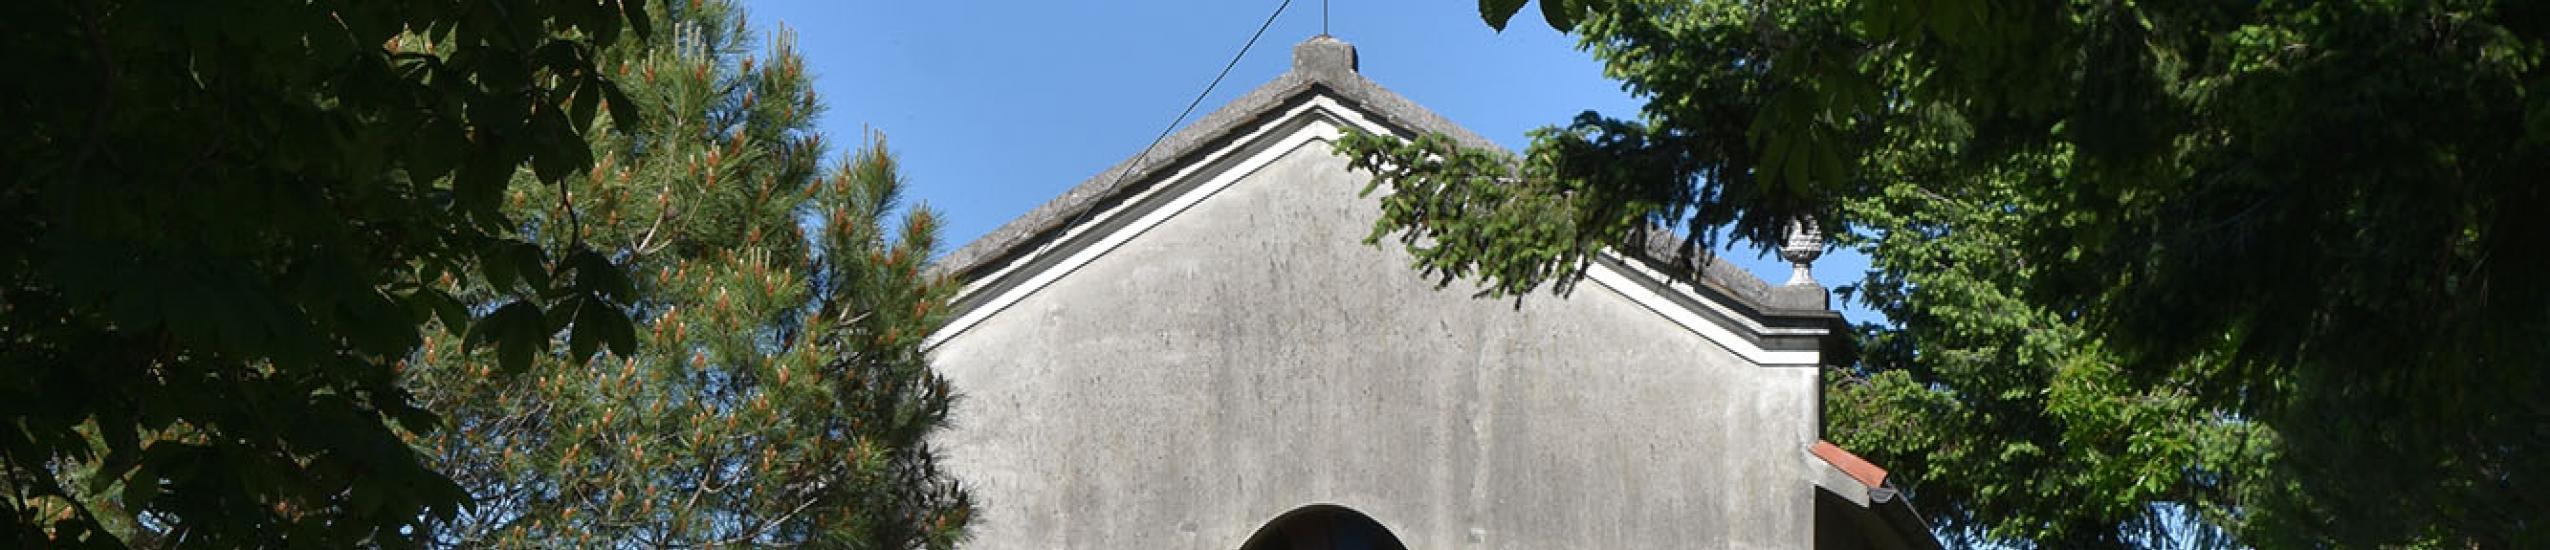 Cimitero di Santa Maria Assunta